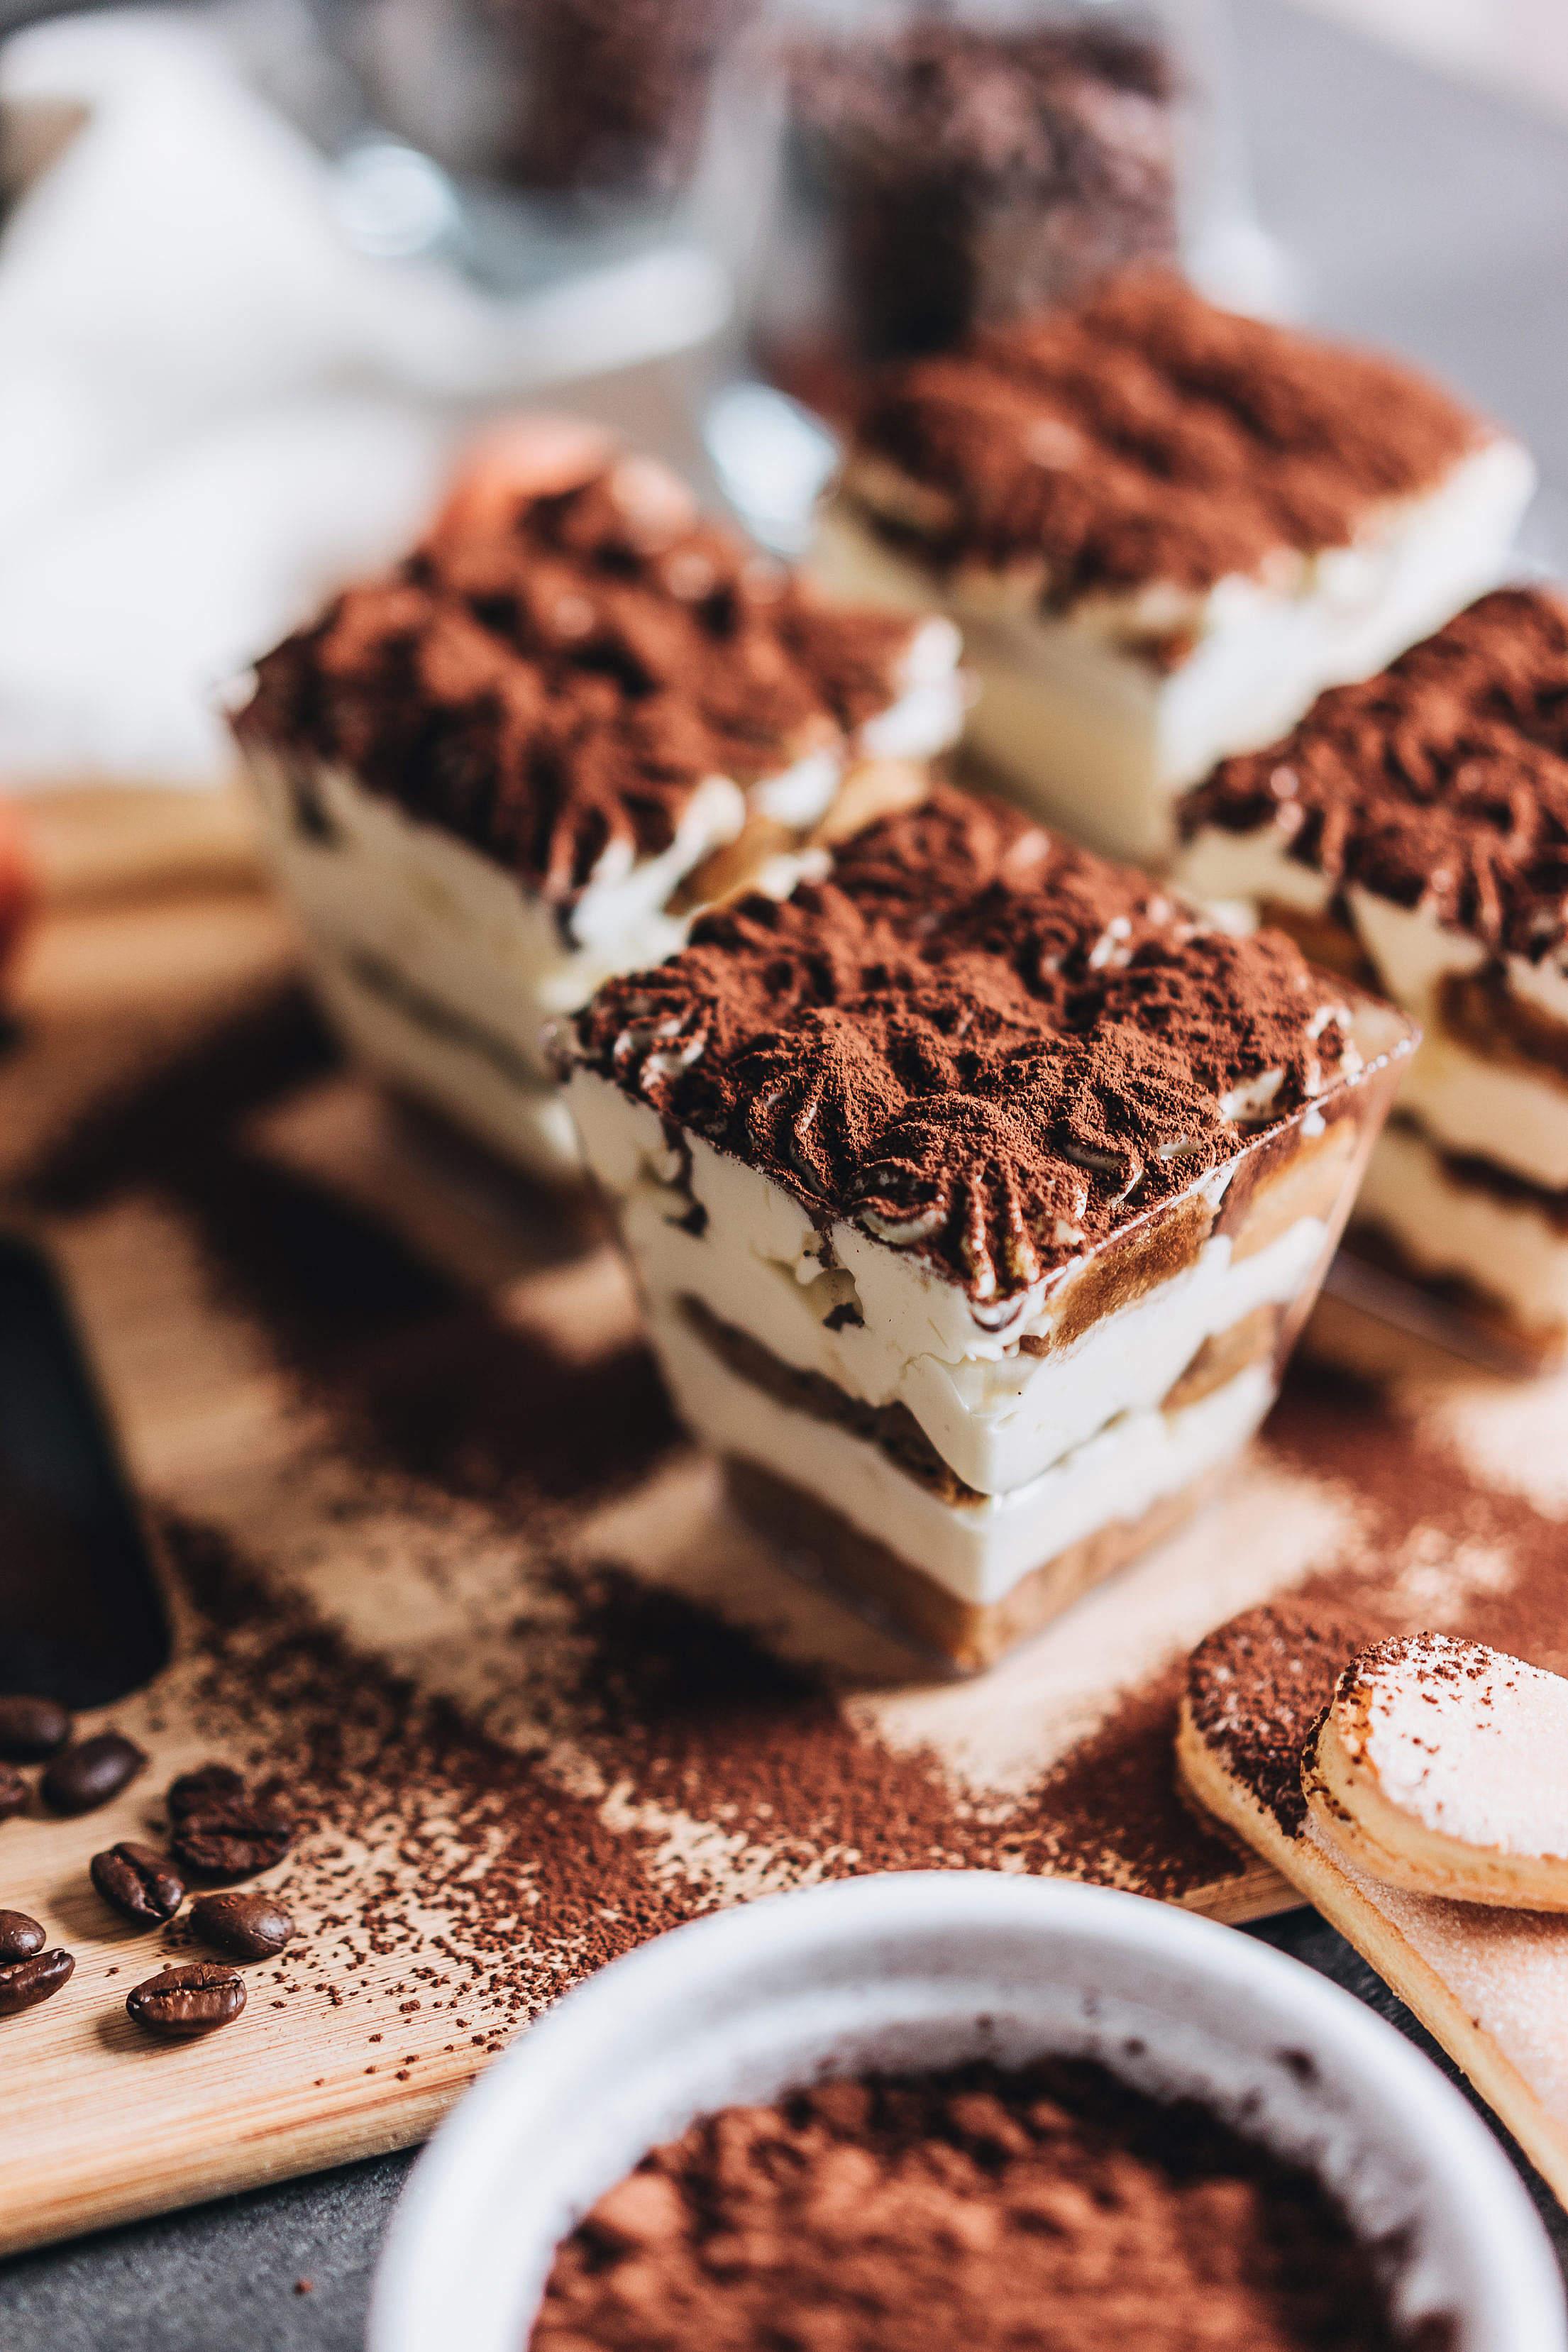 Individual Tiramisu Desserts Free Stock Photo